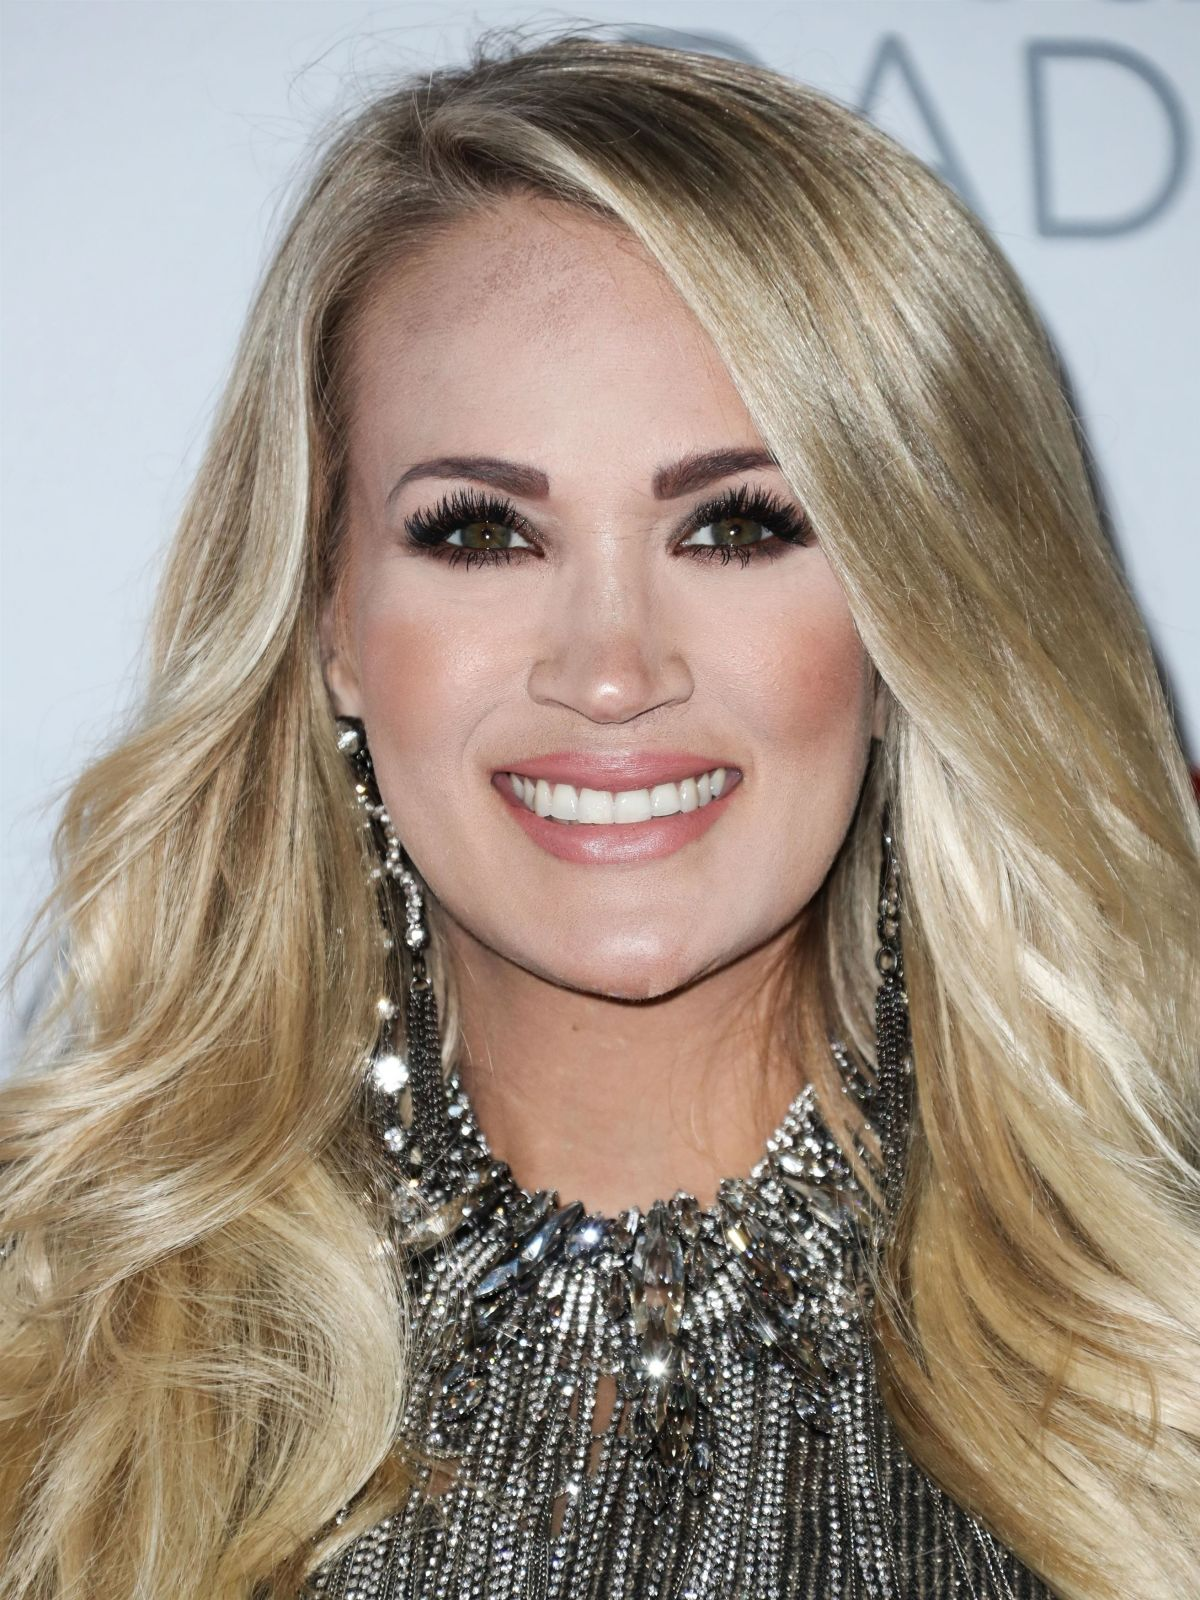 Watch Carrie Underwoods Blown Away Music Video